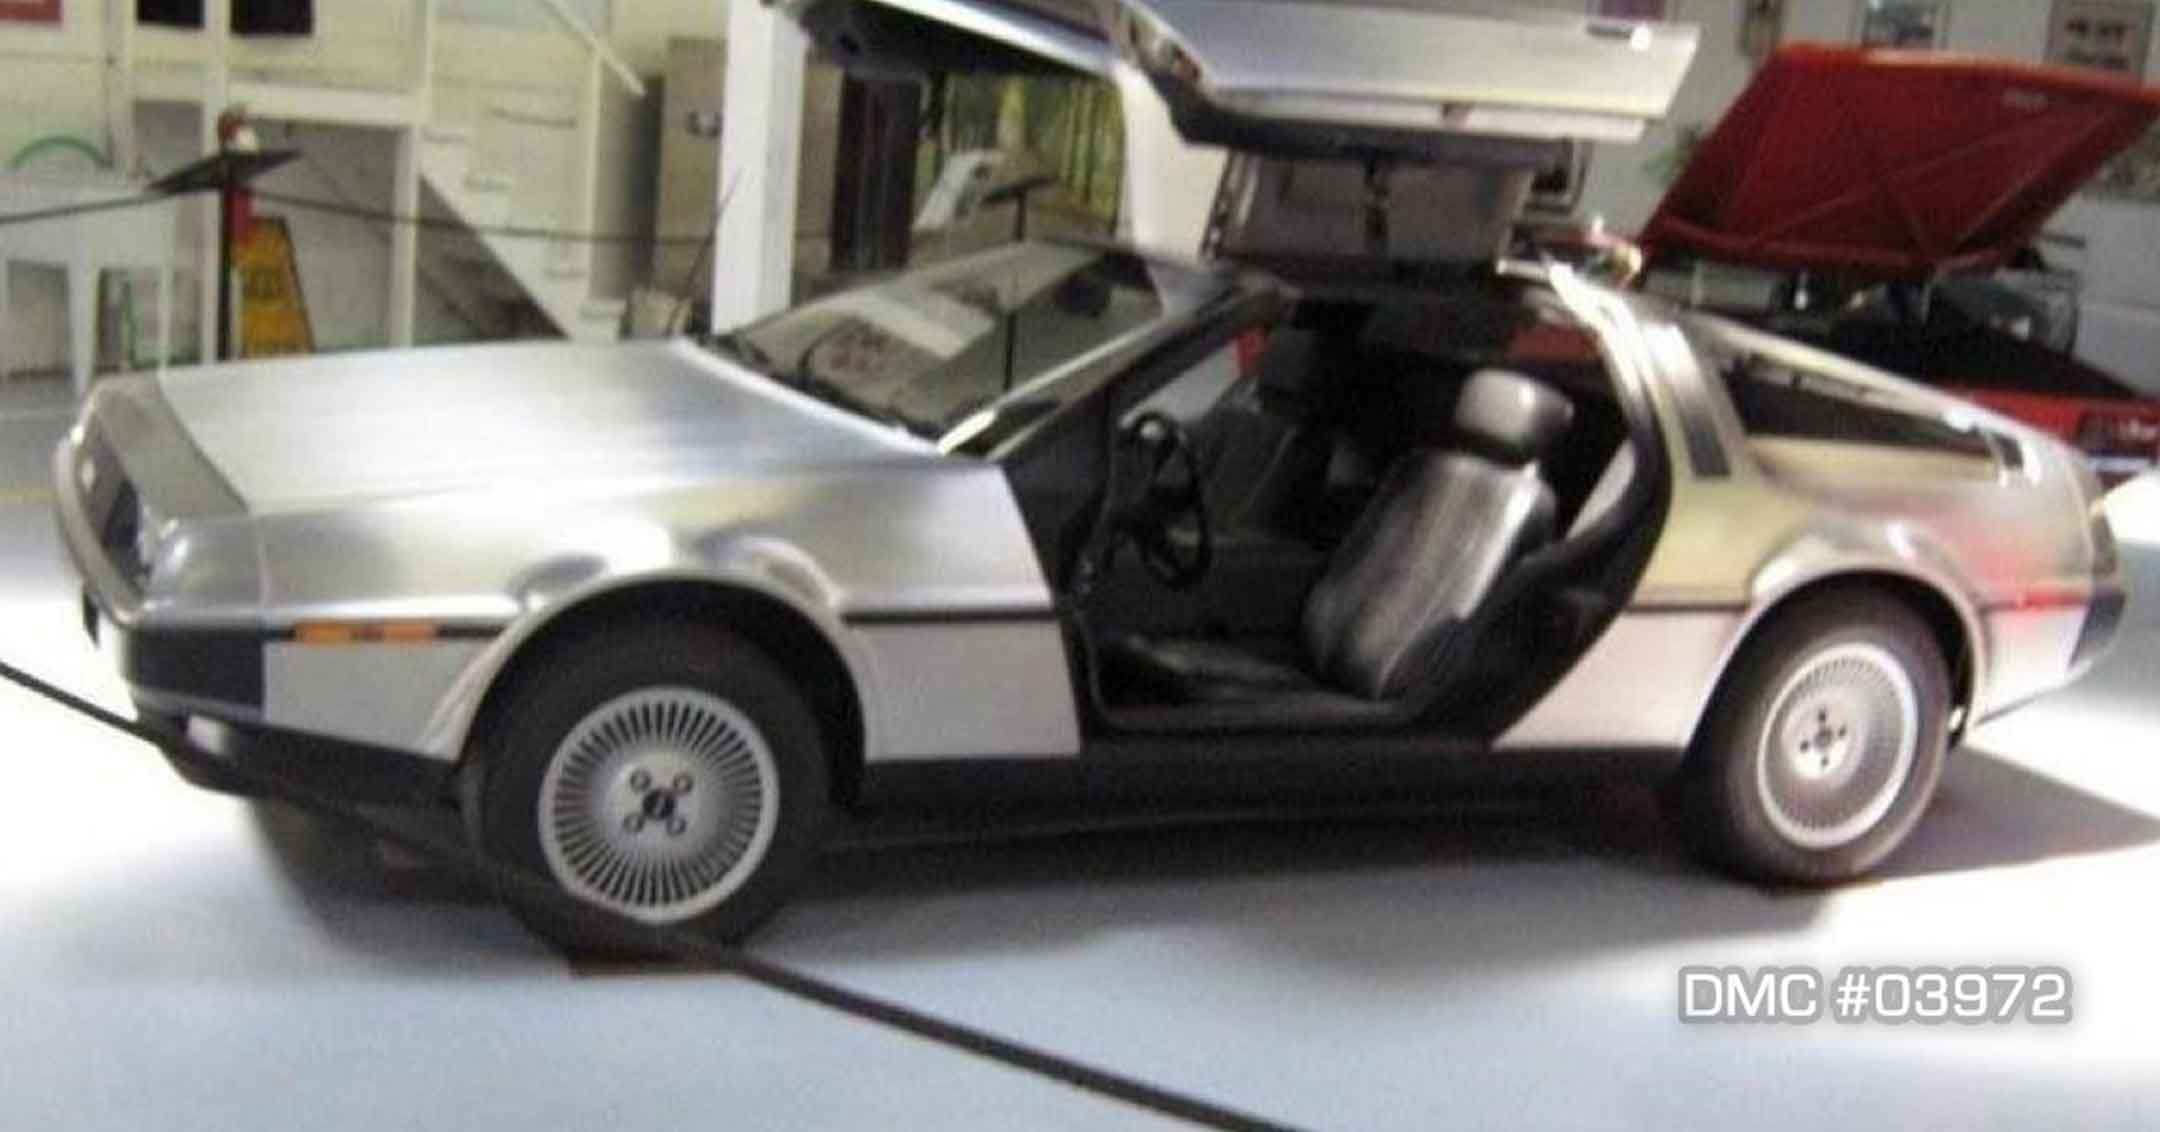 DMC 03972 | DeLoreanDirectory.com